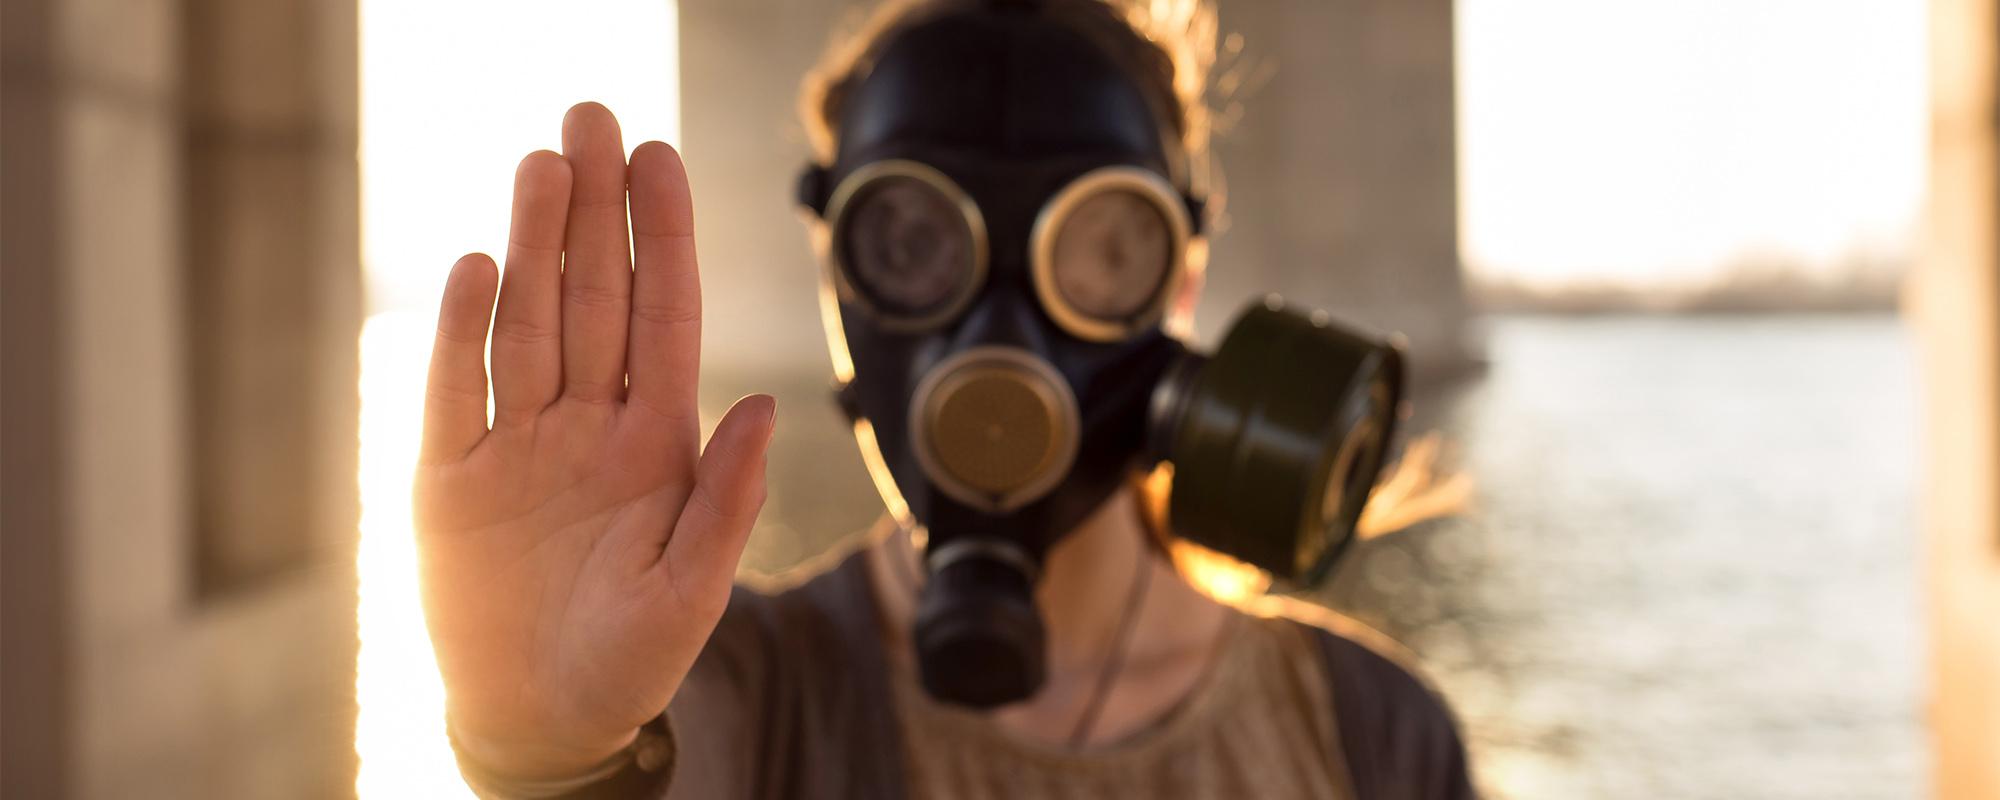 man wearing gas mask hand up